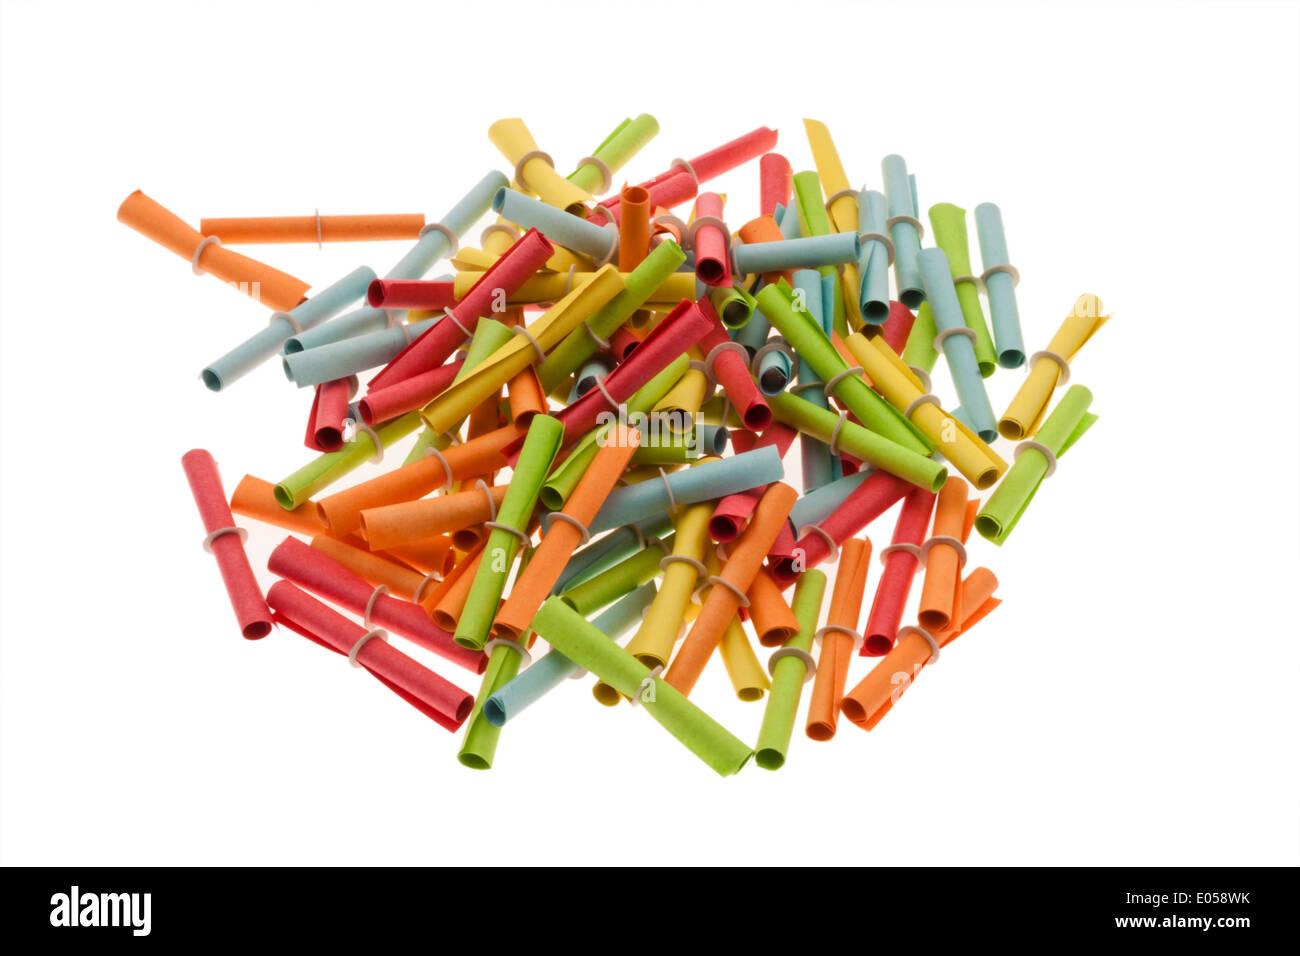 Many coloured Chinese Without luck lie chaotically in a mess, Viele bunte chinesische Glueckslose wirr liegen durcheinander - Stock Image